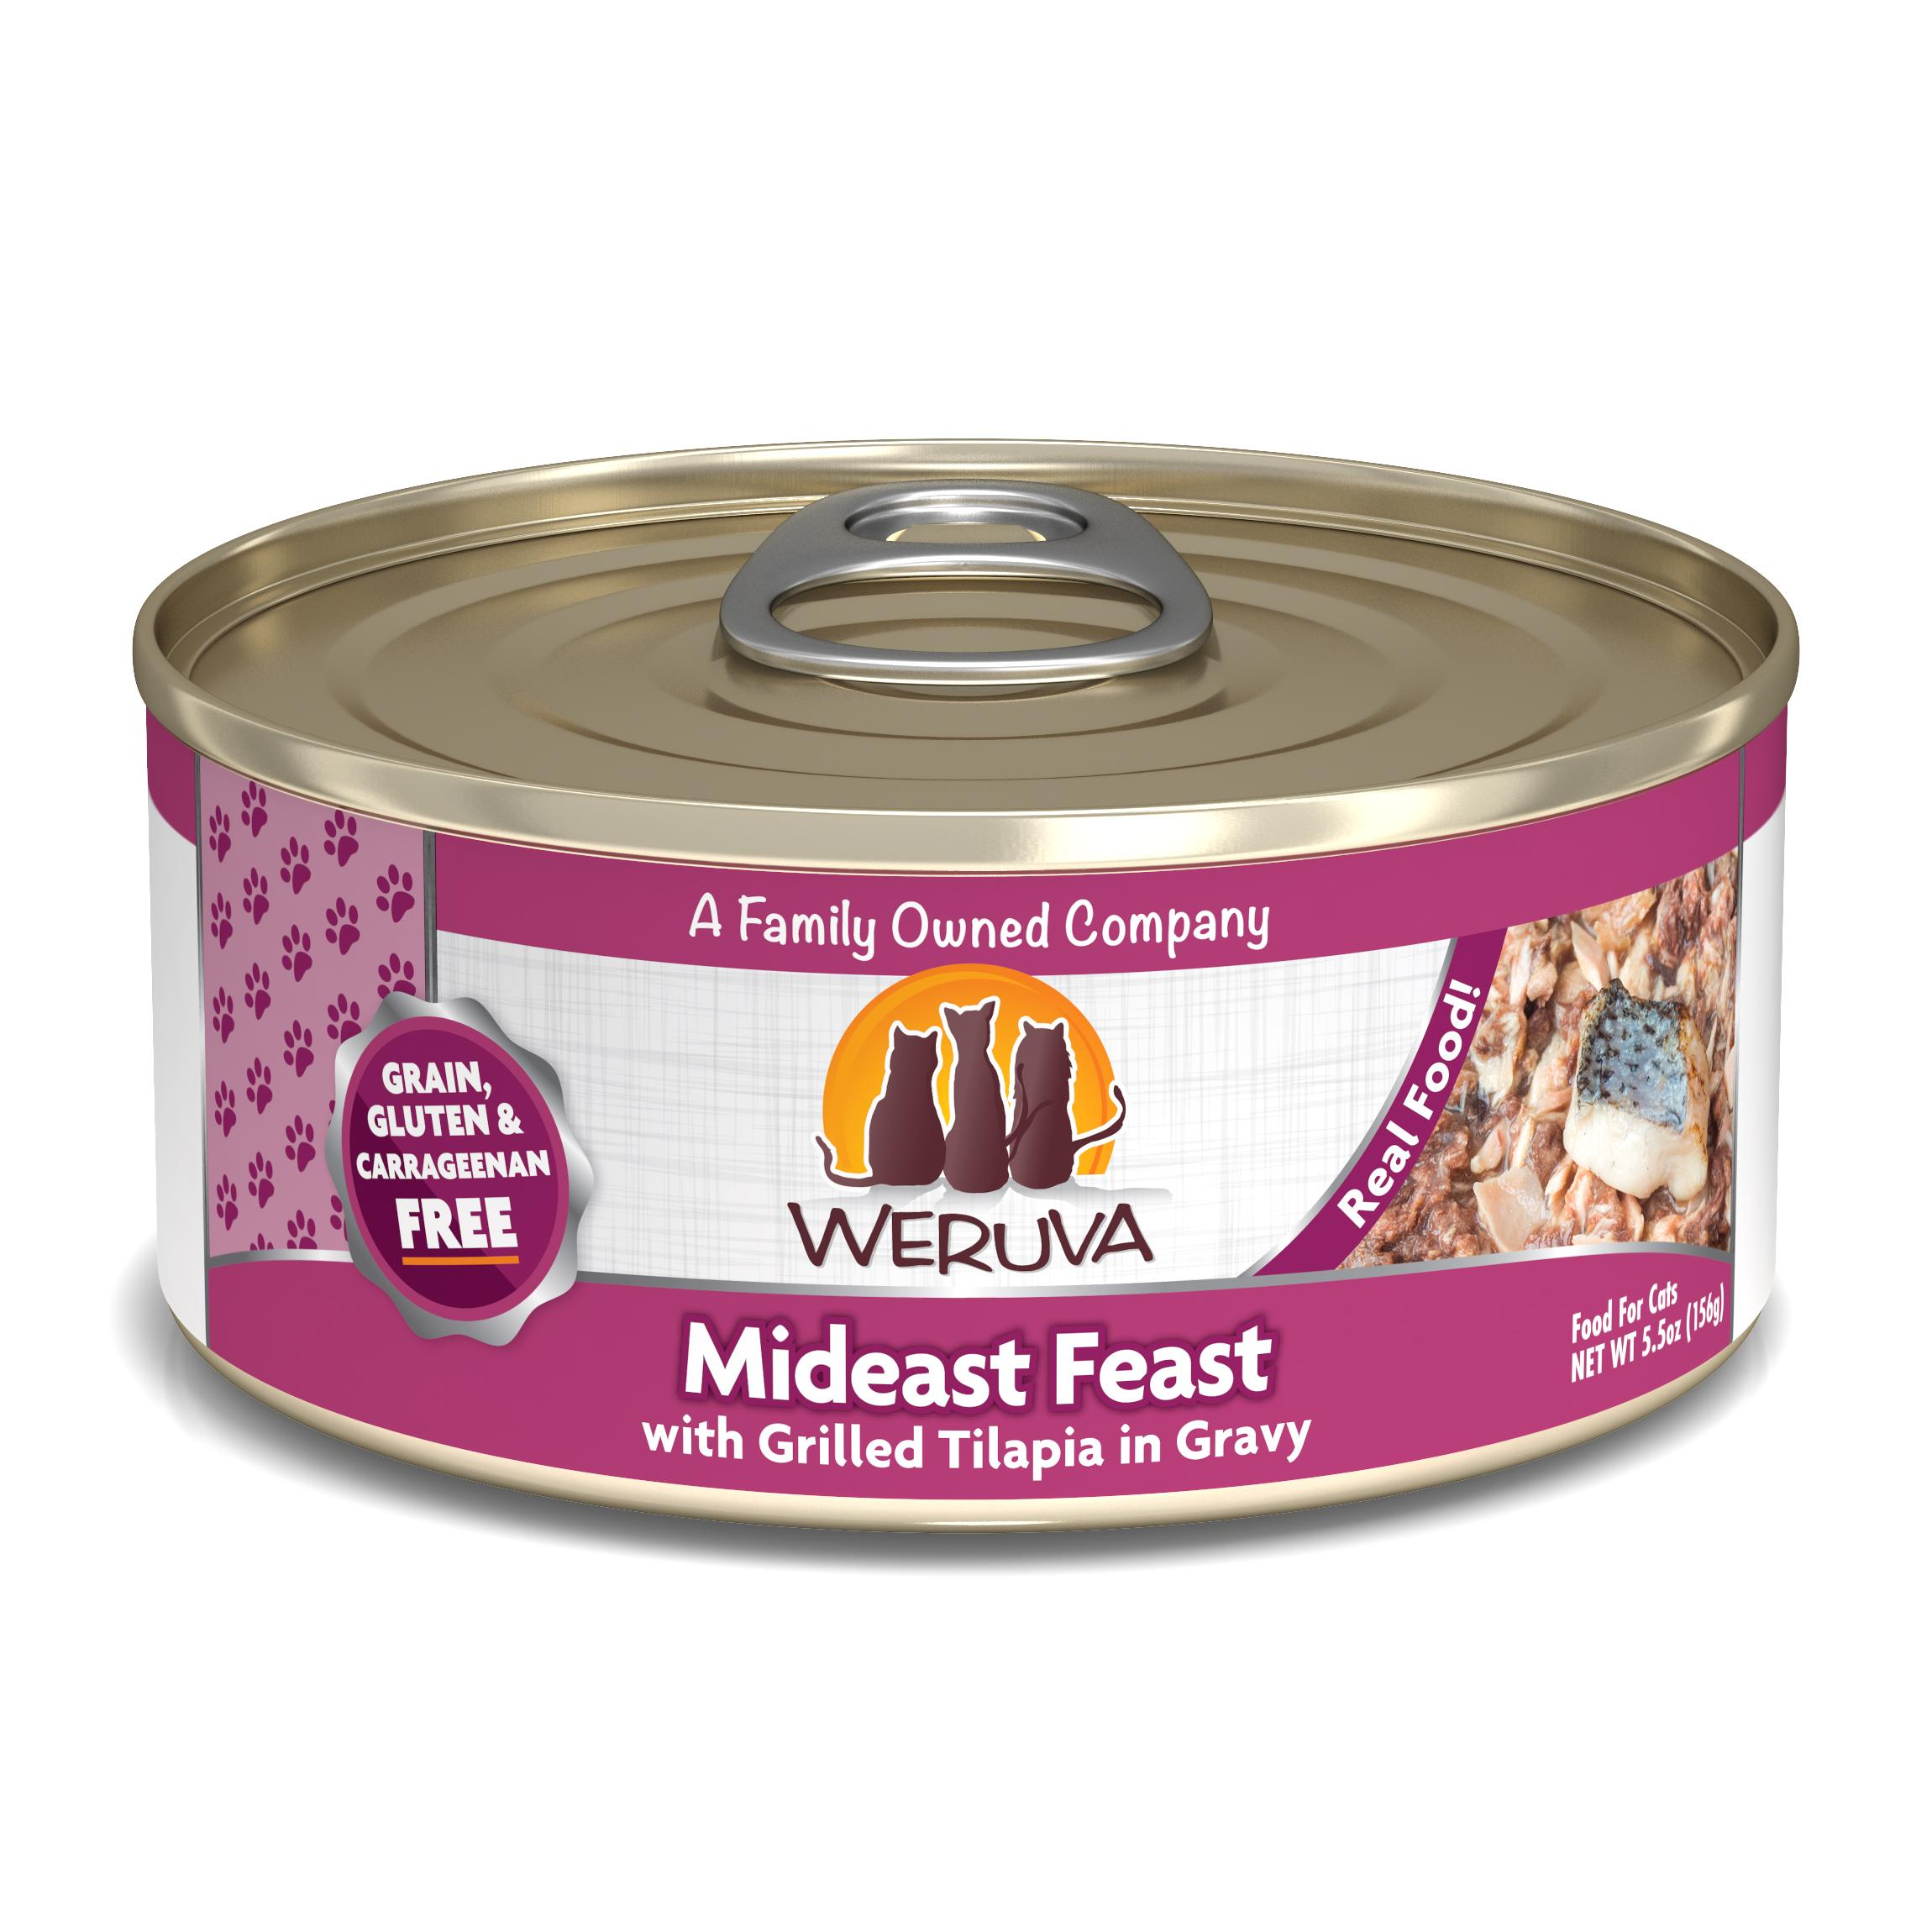 Weruva Cat Classic Mideast Feast with Grilled Tilapia in Gravy Grain-Free Wet Cat Food, 5.5-oz